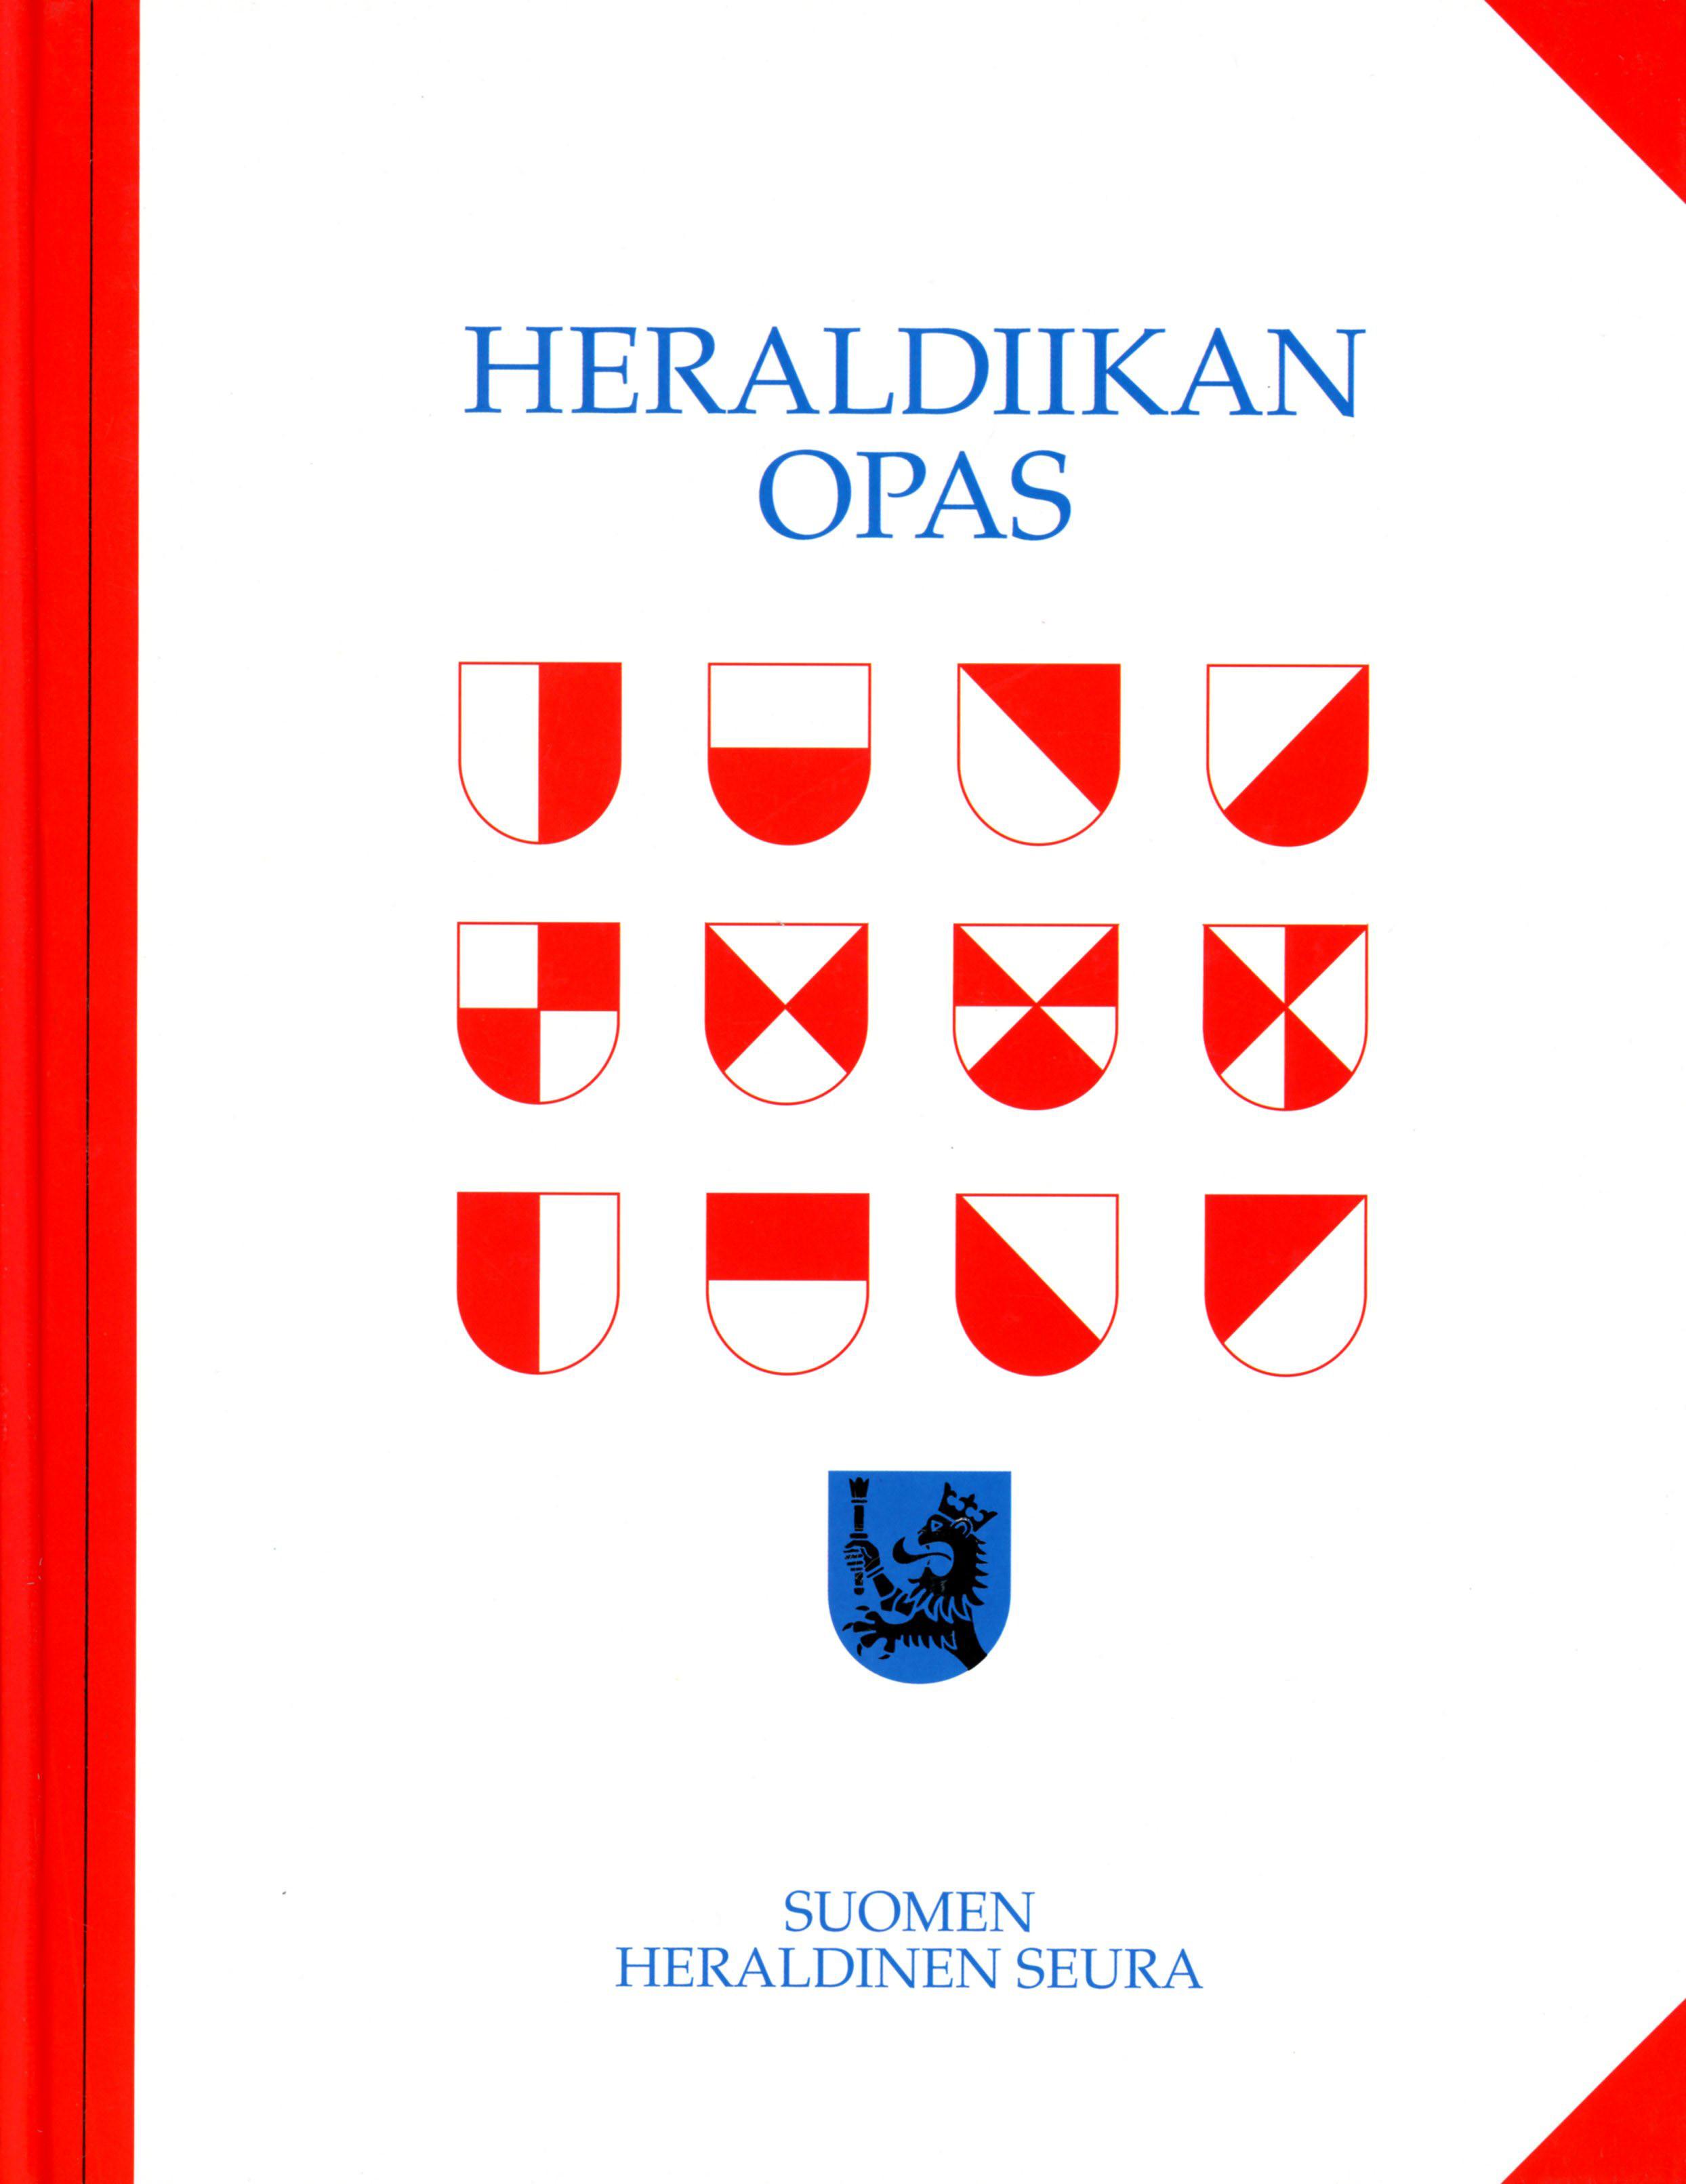 Heraldiikan opas Kara, Kimmo; Harmo, Maunu; Hillo, Hannu ym. kirja